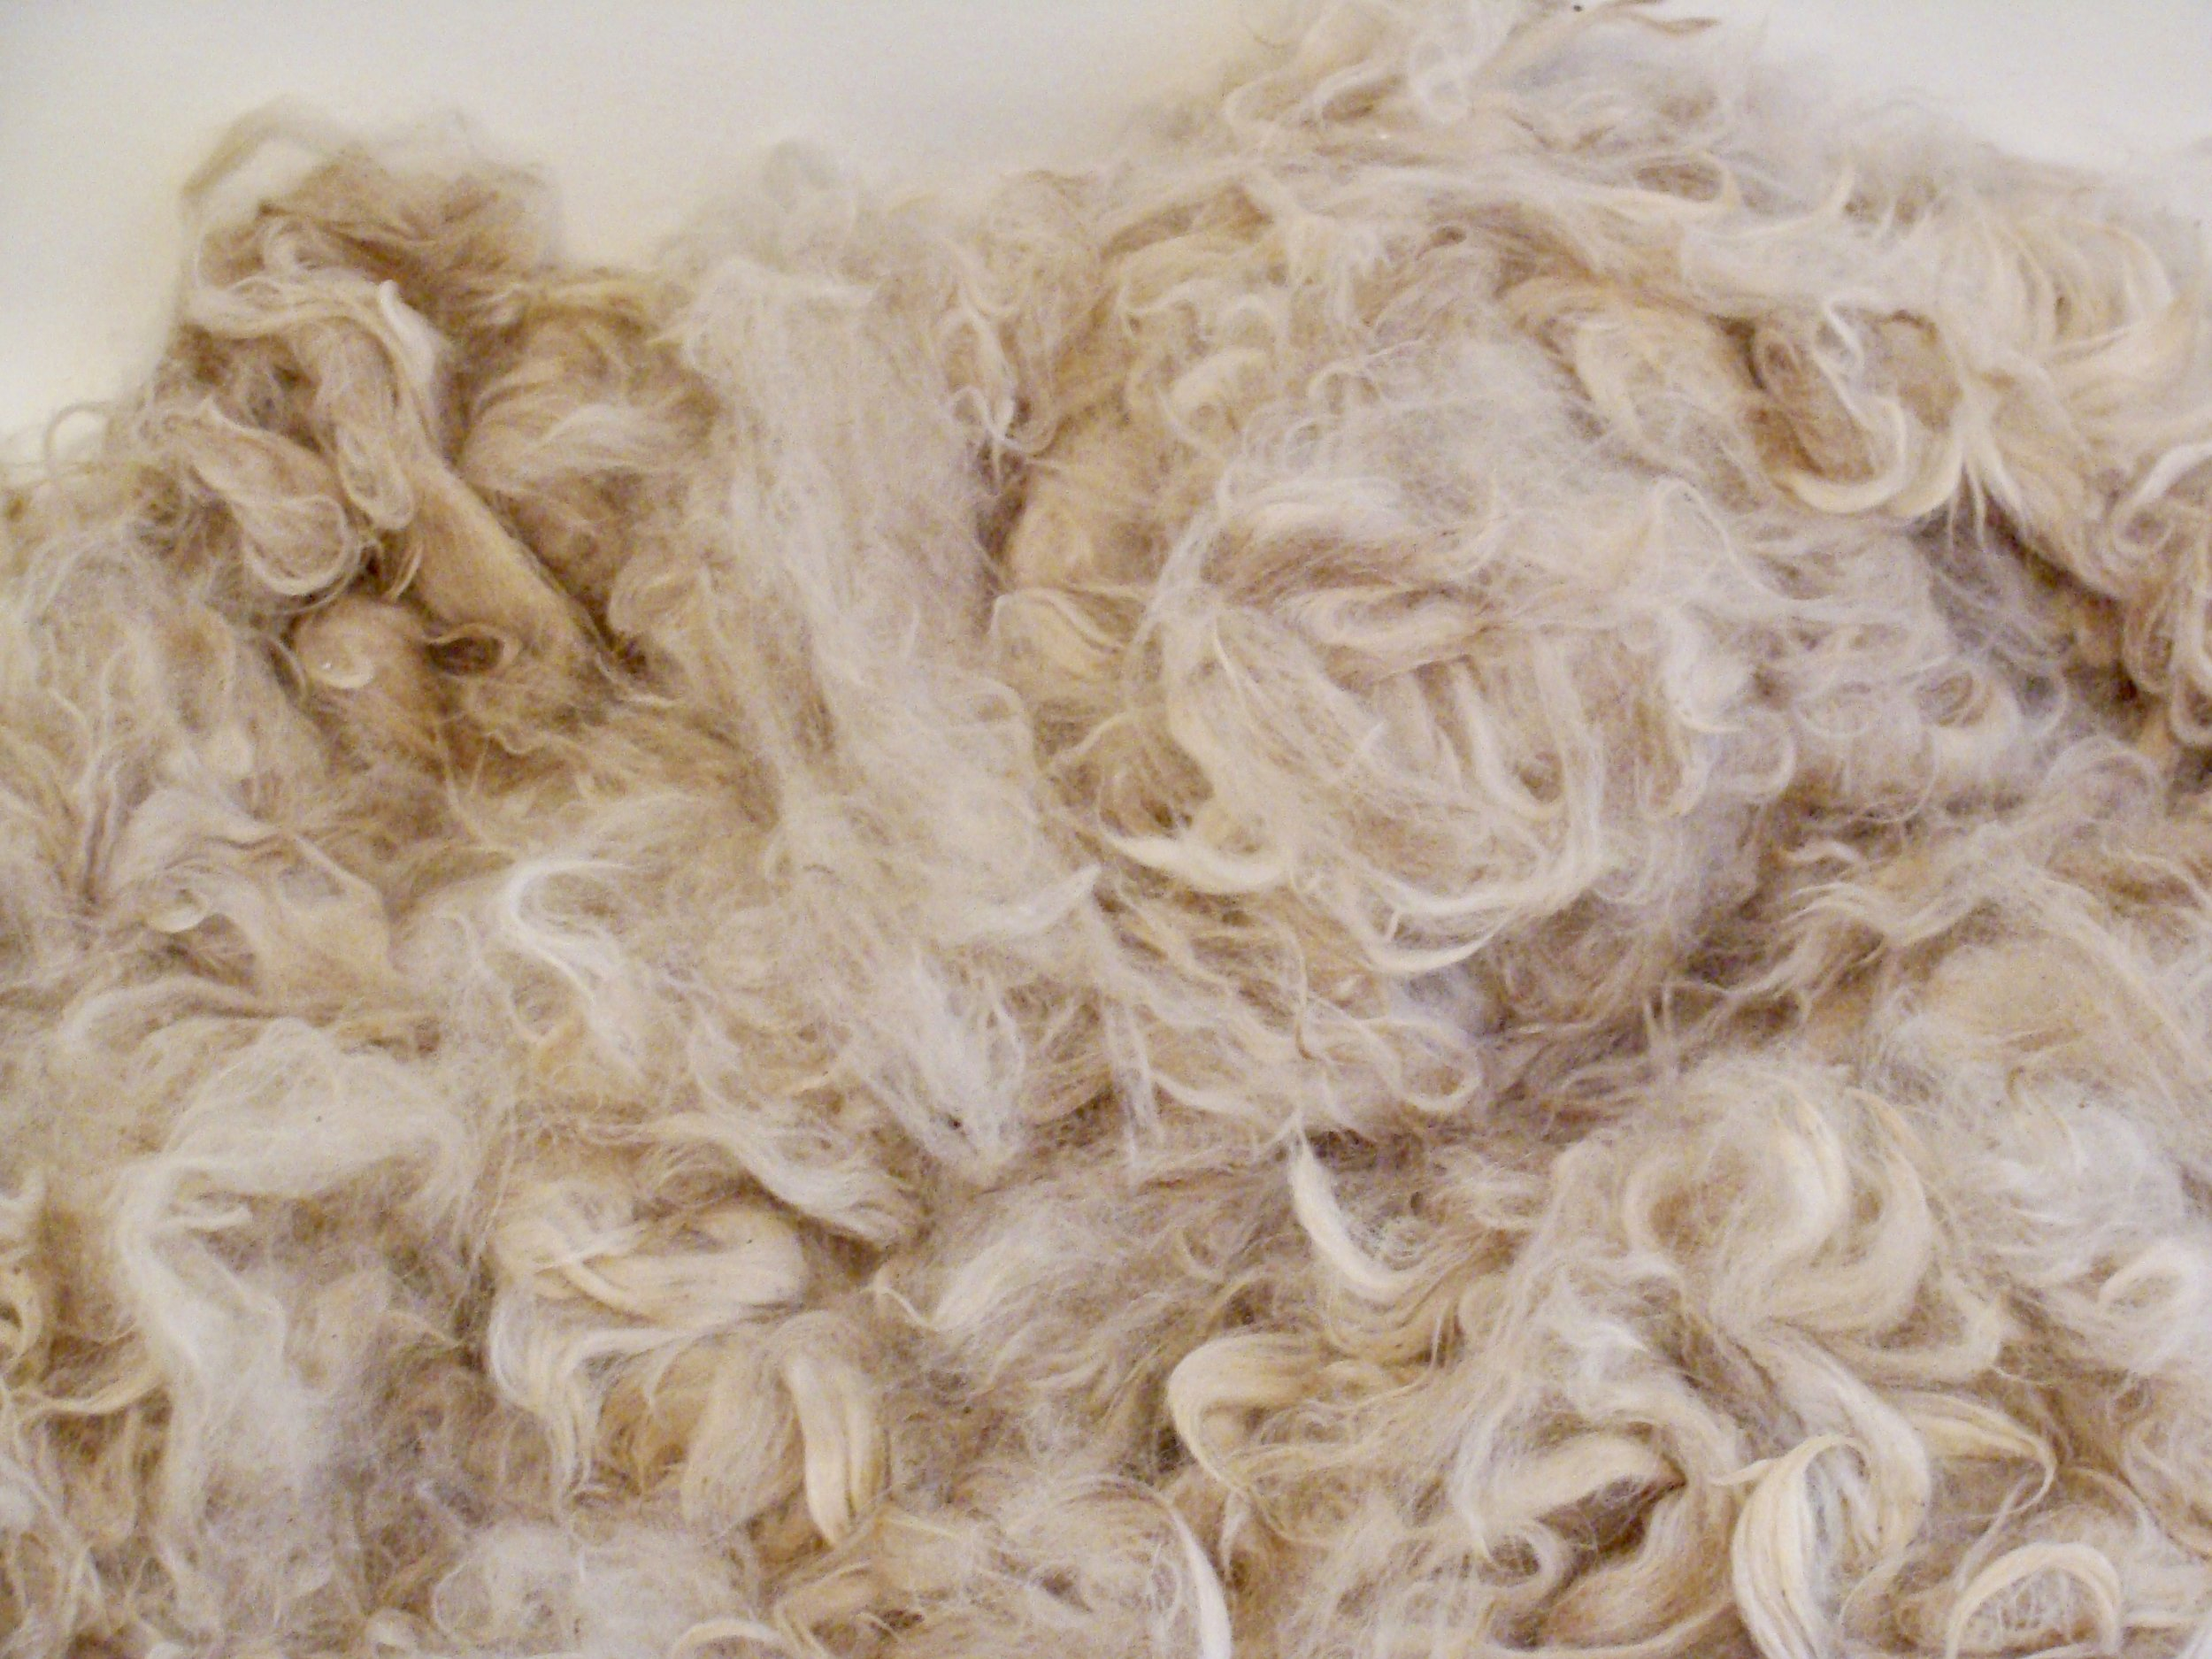 'Regalia' alpaca raw fleece